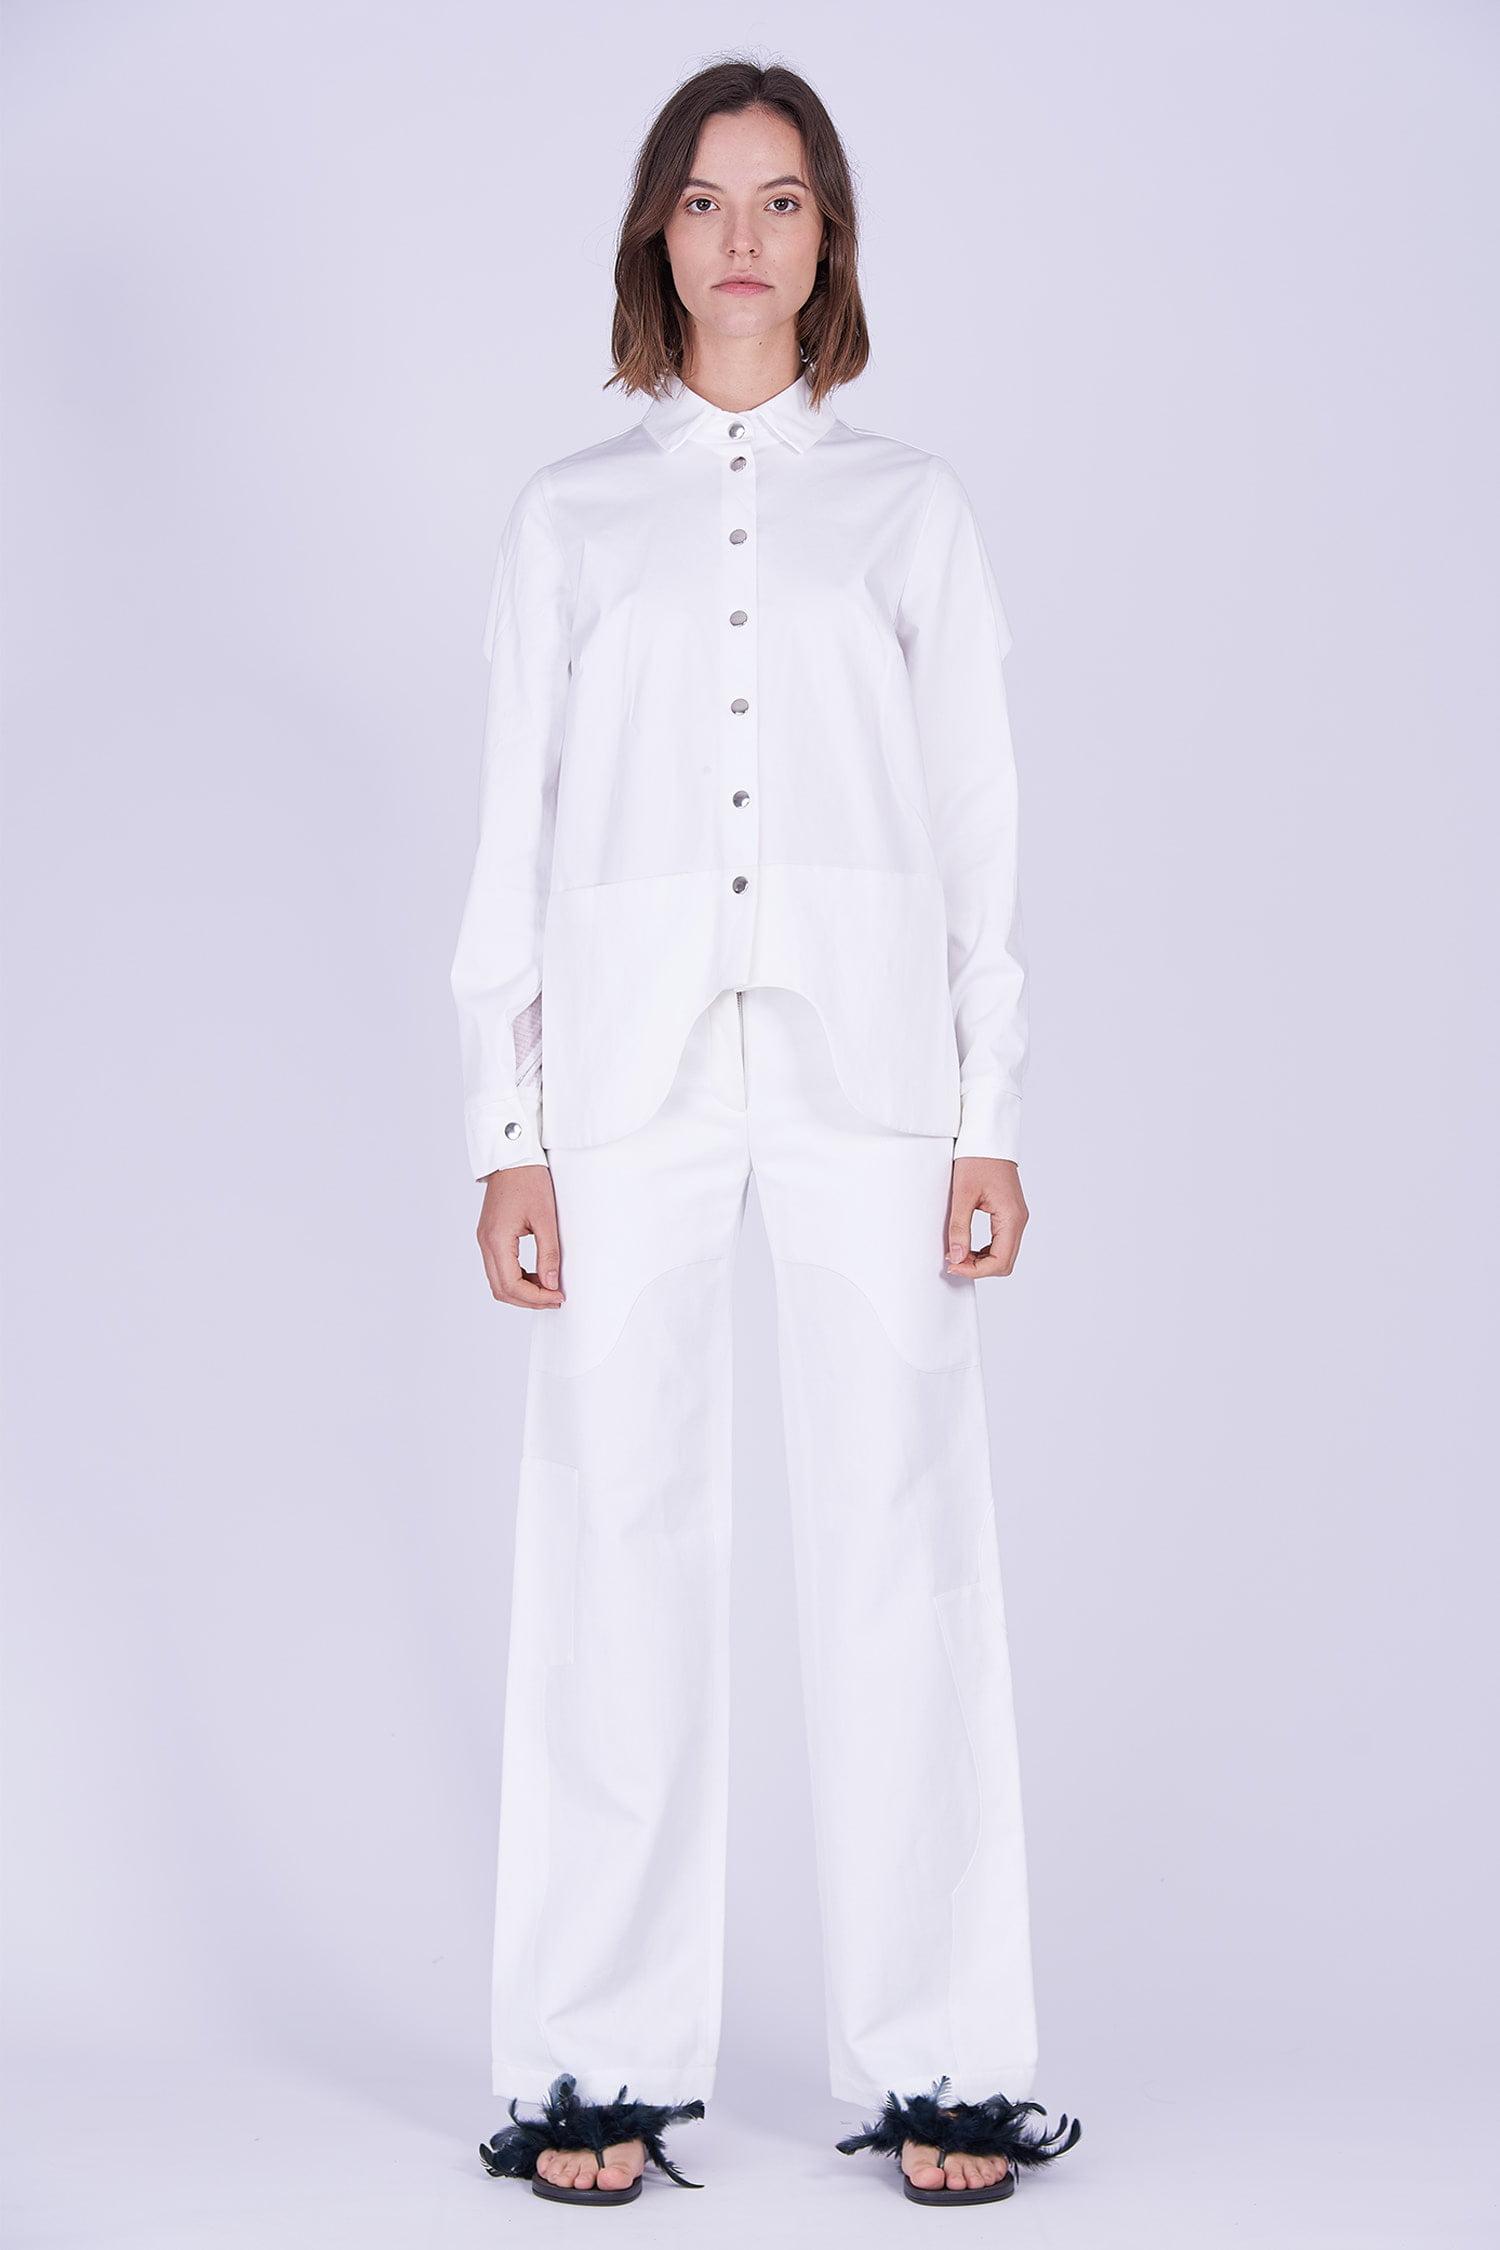 Acephala Ps2020 White Shirt White Trousers Front